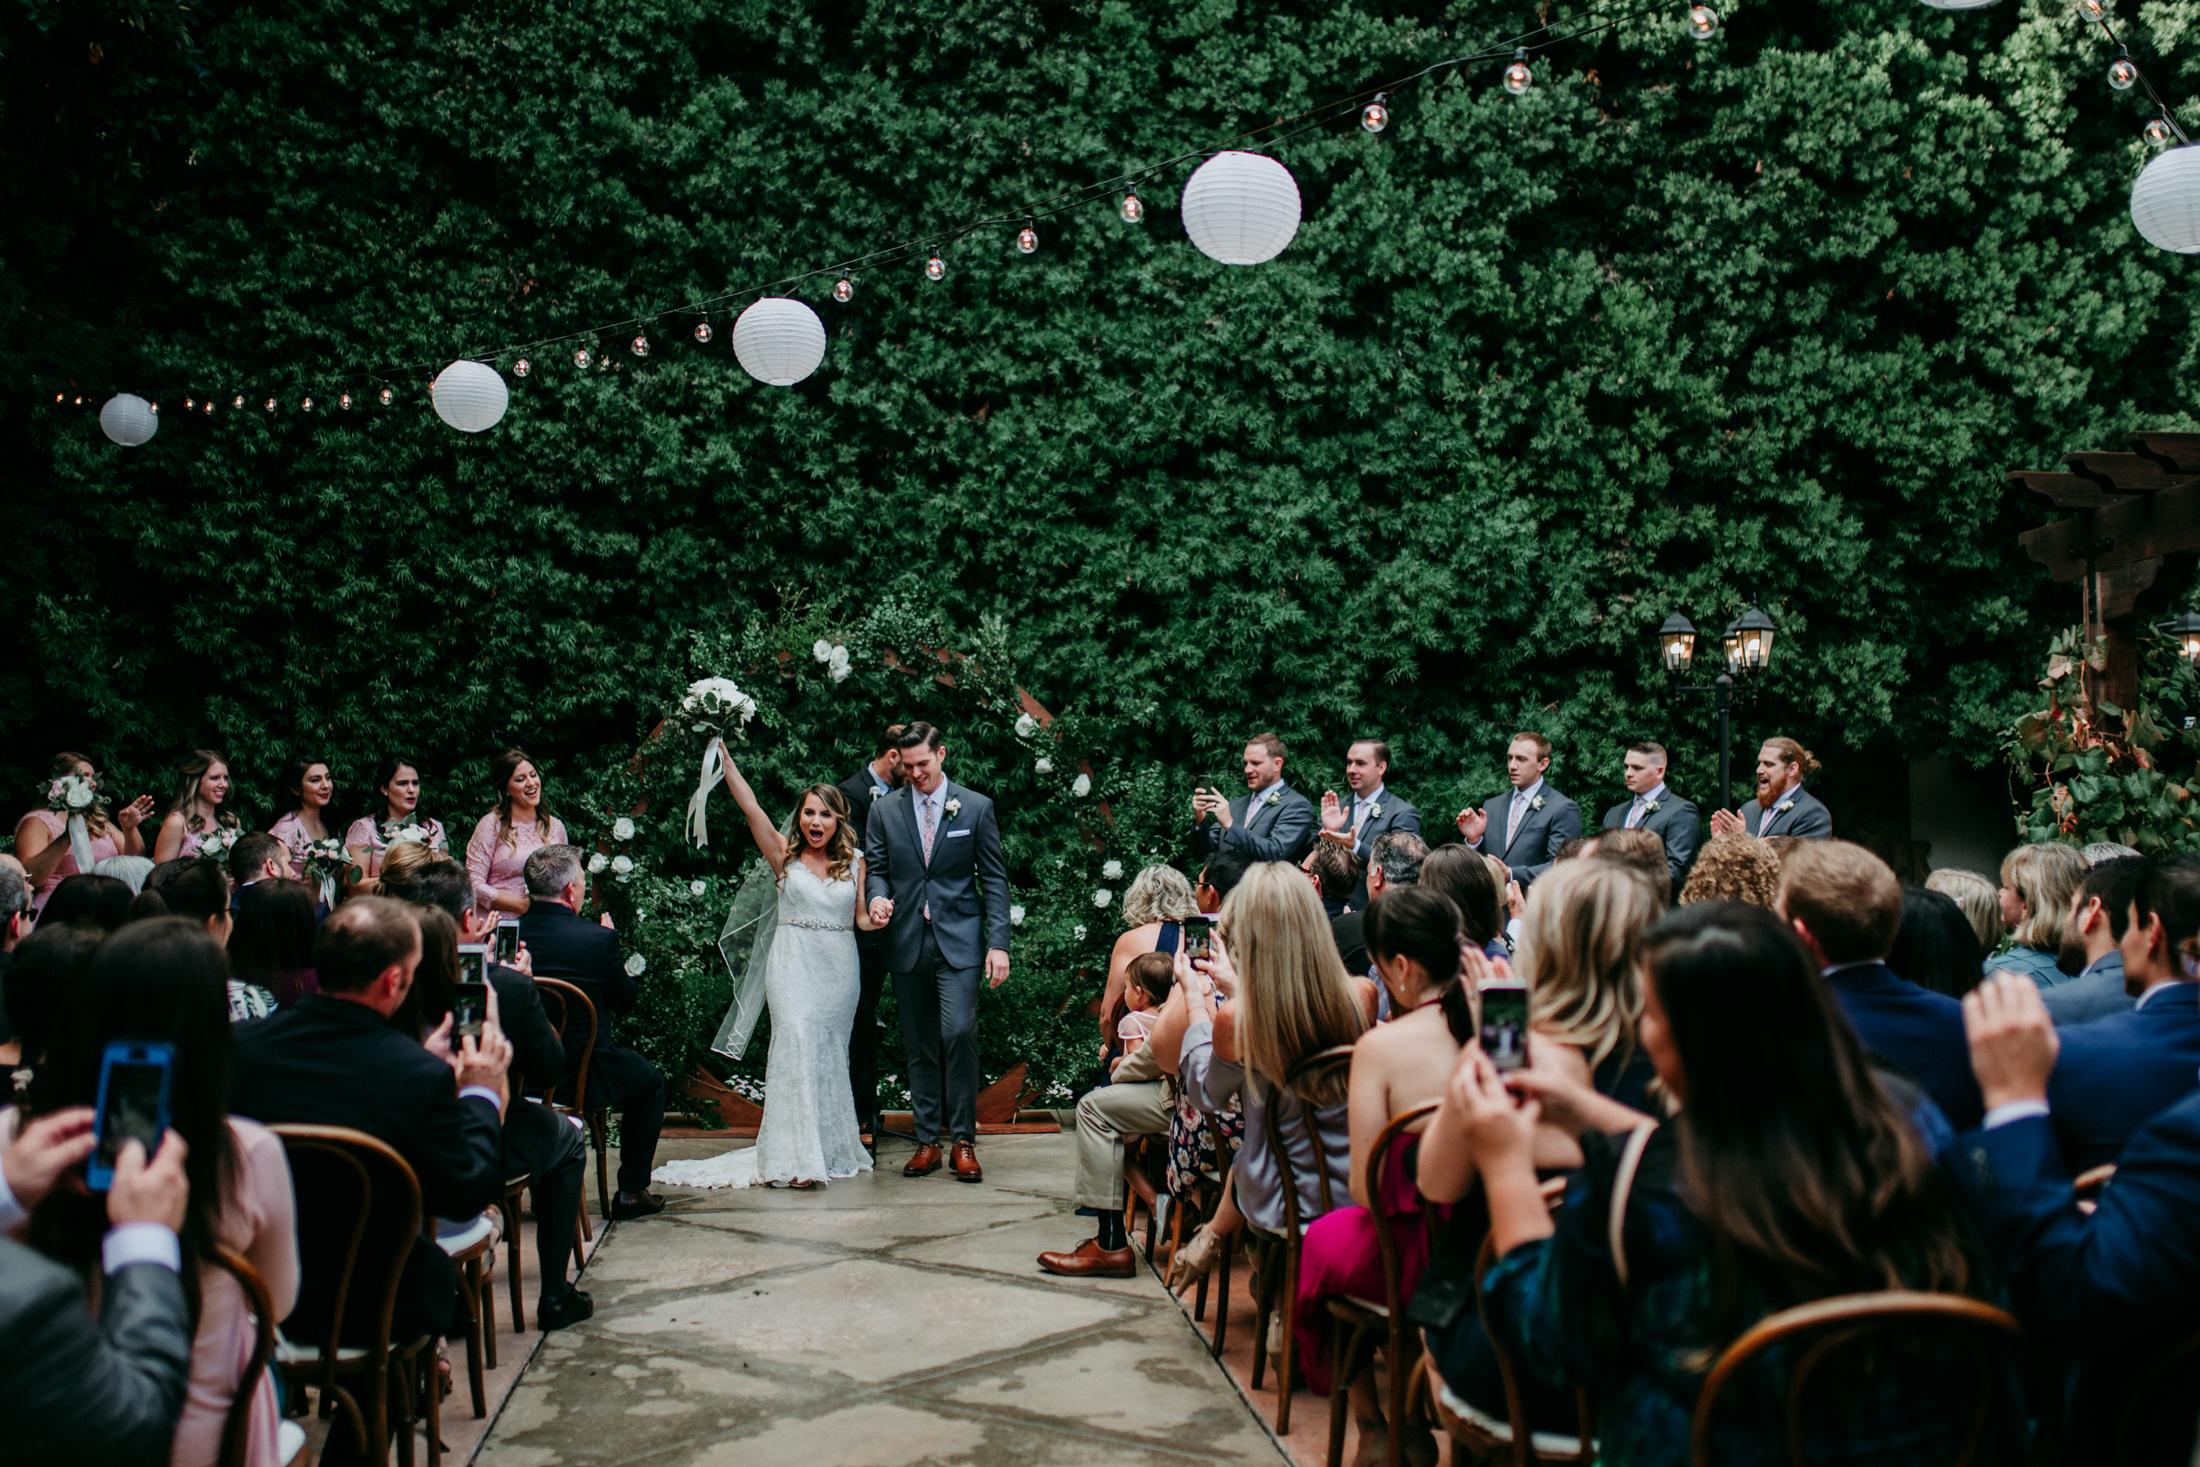 franciscan_garden_wedding-44.jpg